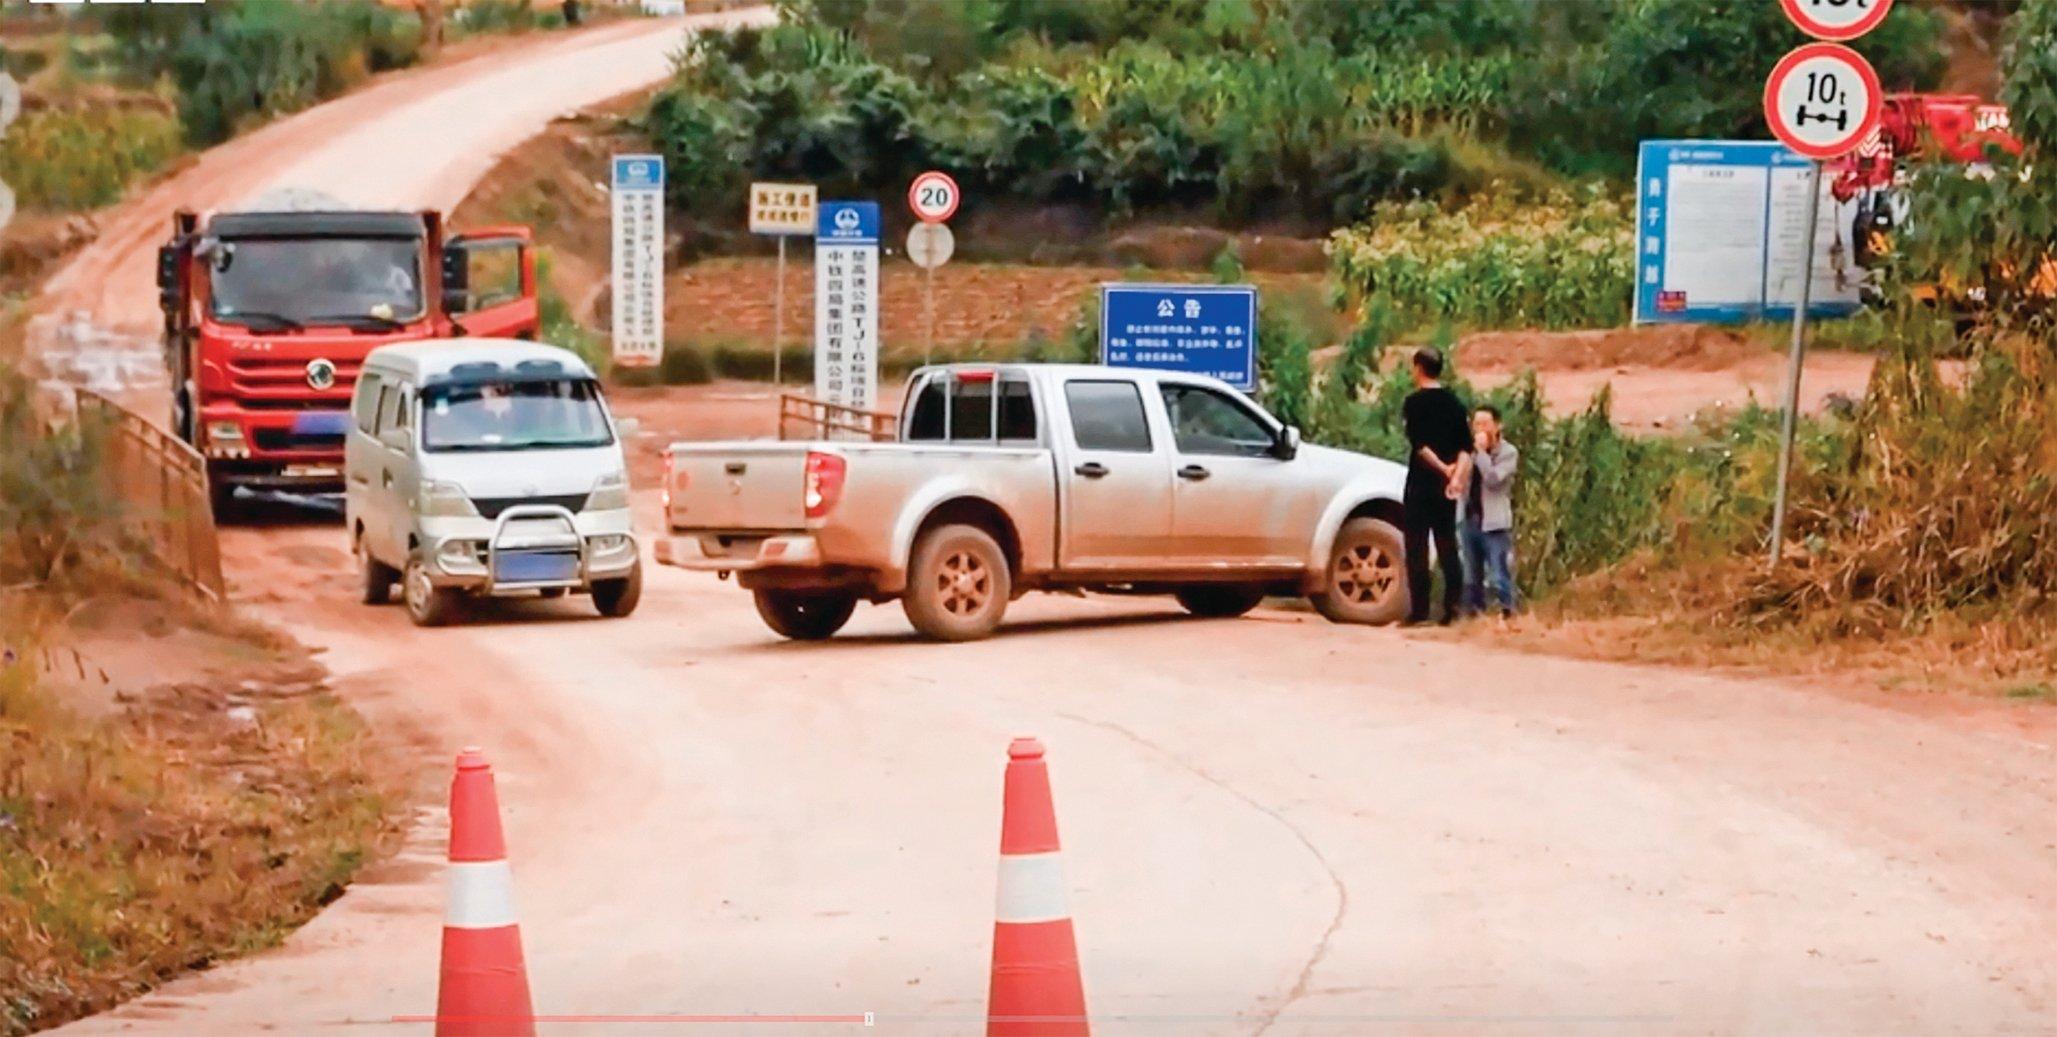 BBC記者走訪雲南礦洞過程中,當局設法跟蹤攔截,記者最終無法靠近礦洞。(視頻截圖)